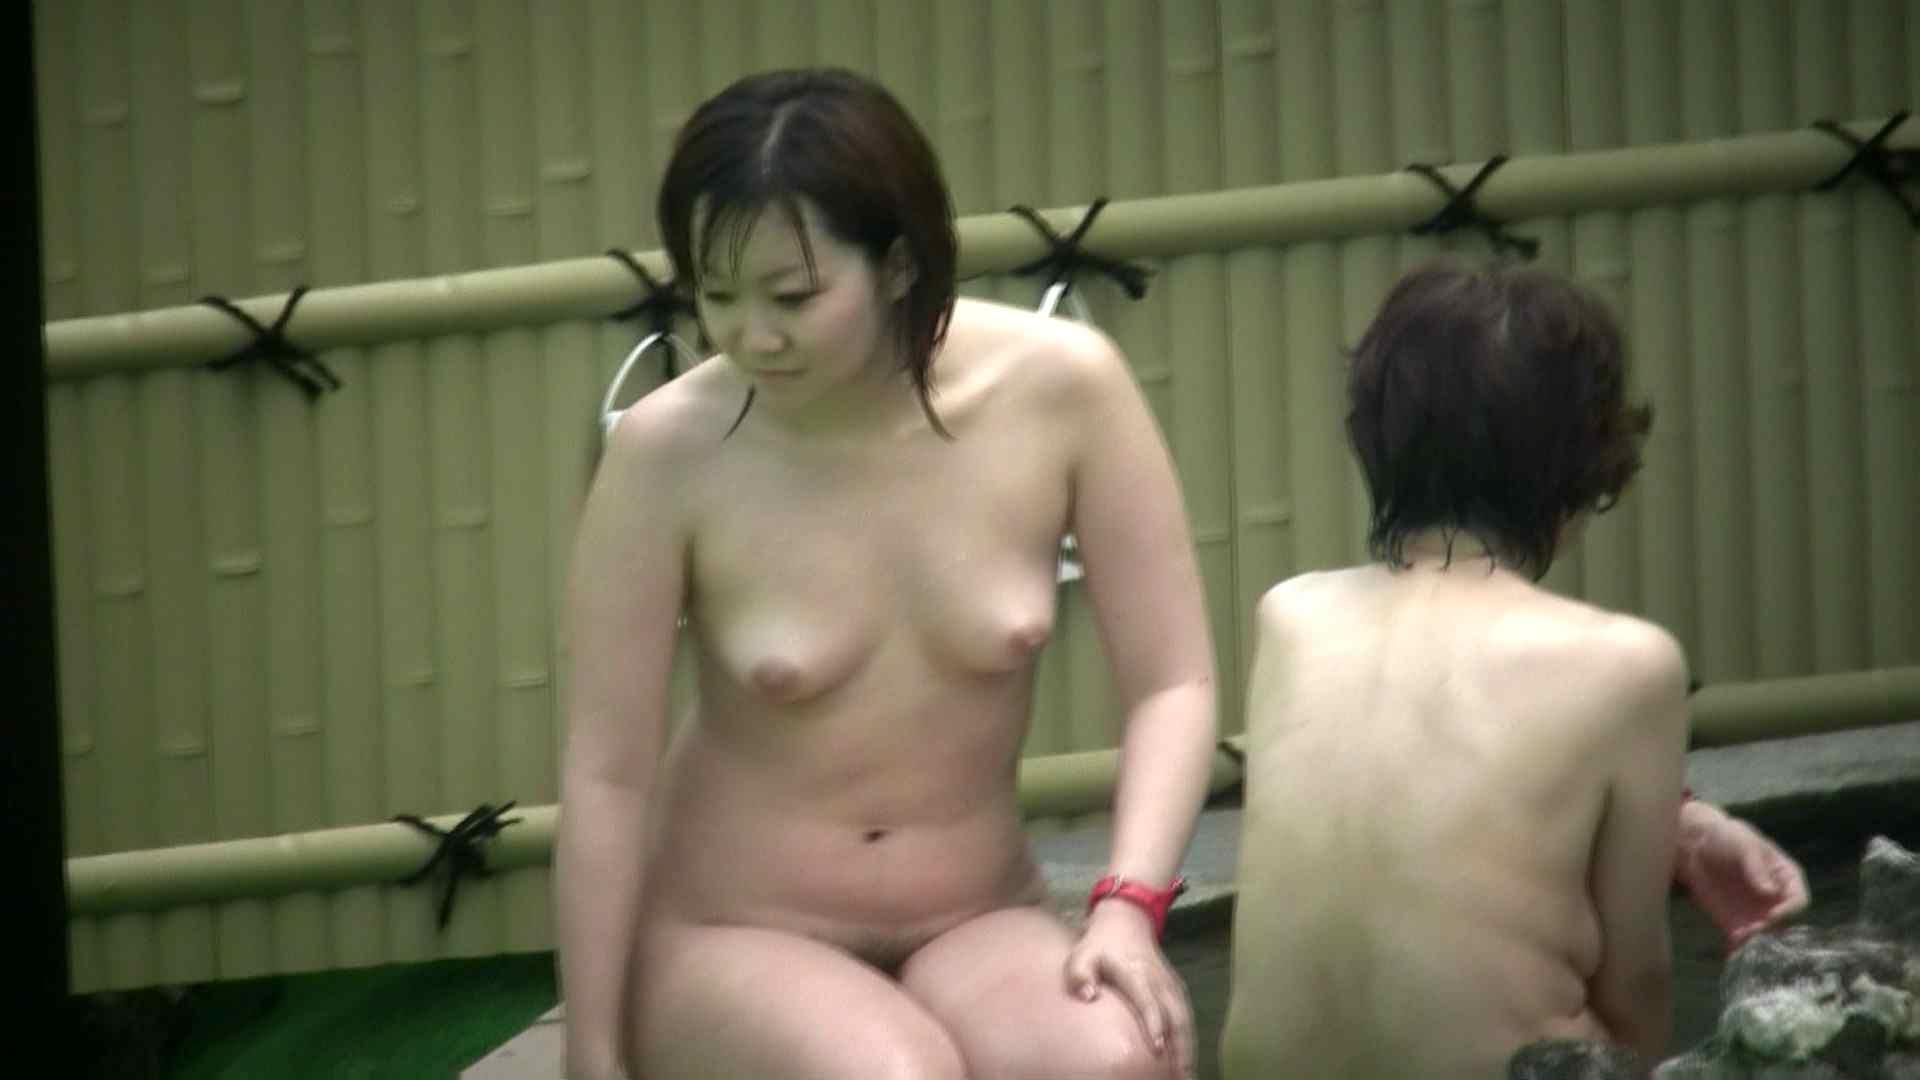 Aquaな露天風呂Vol.664 露天 性交動画流出 70連発 8